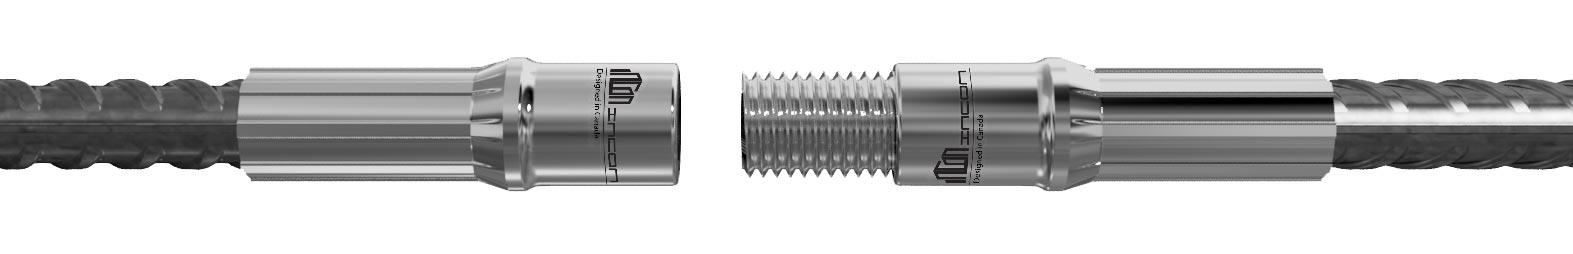 STEP 1 — ICS Standard Coupler